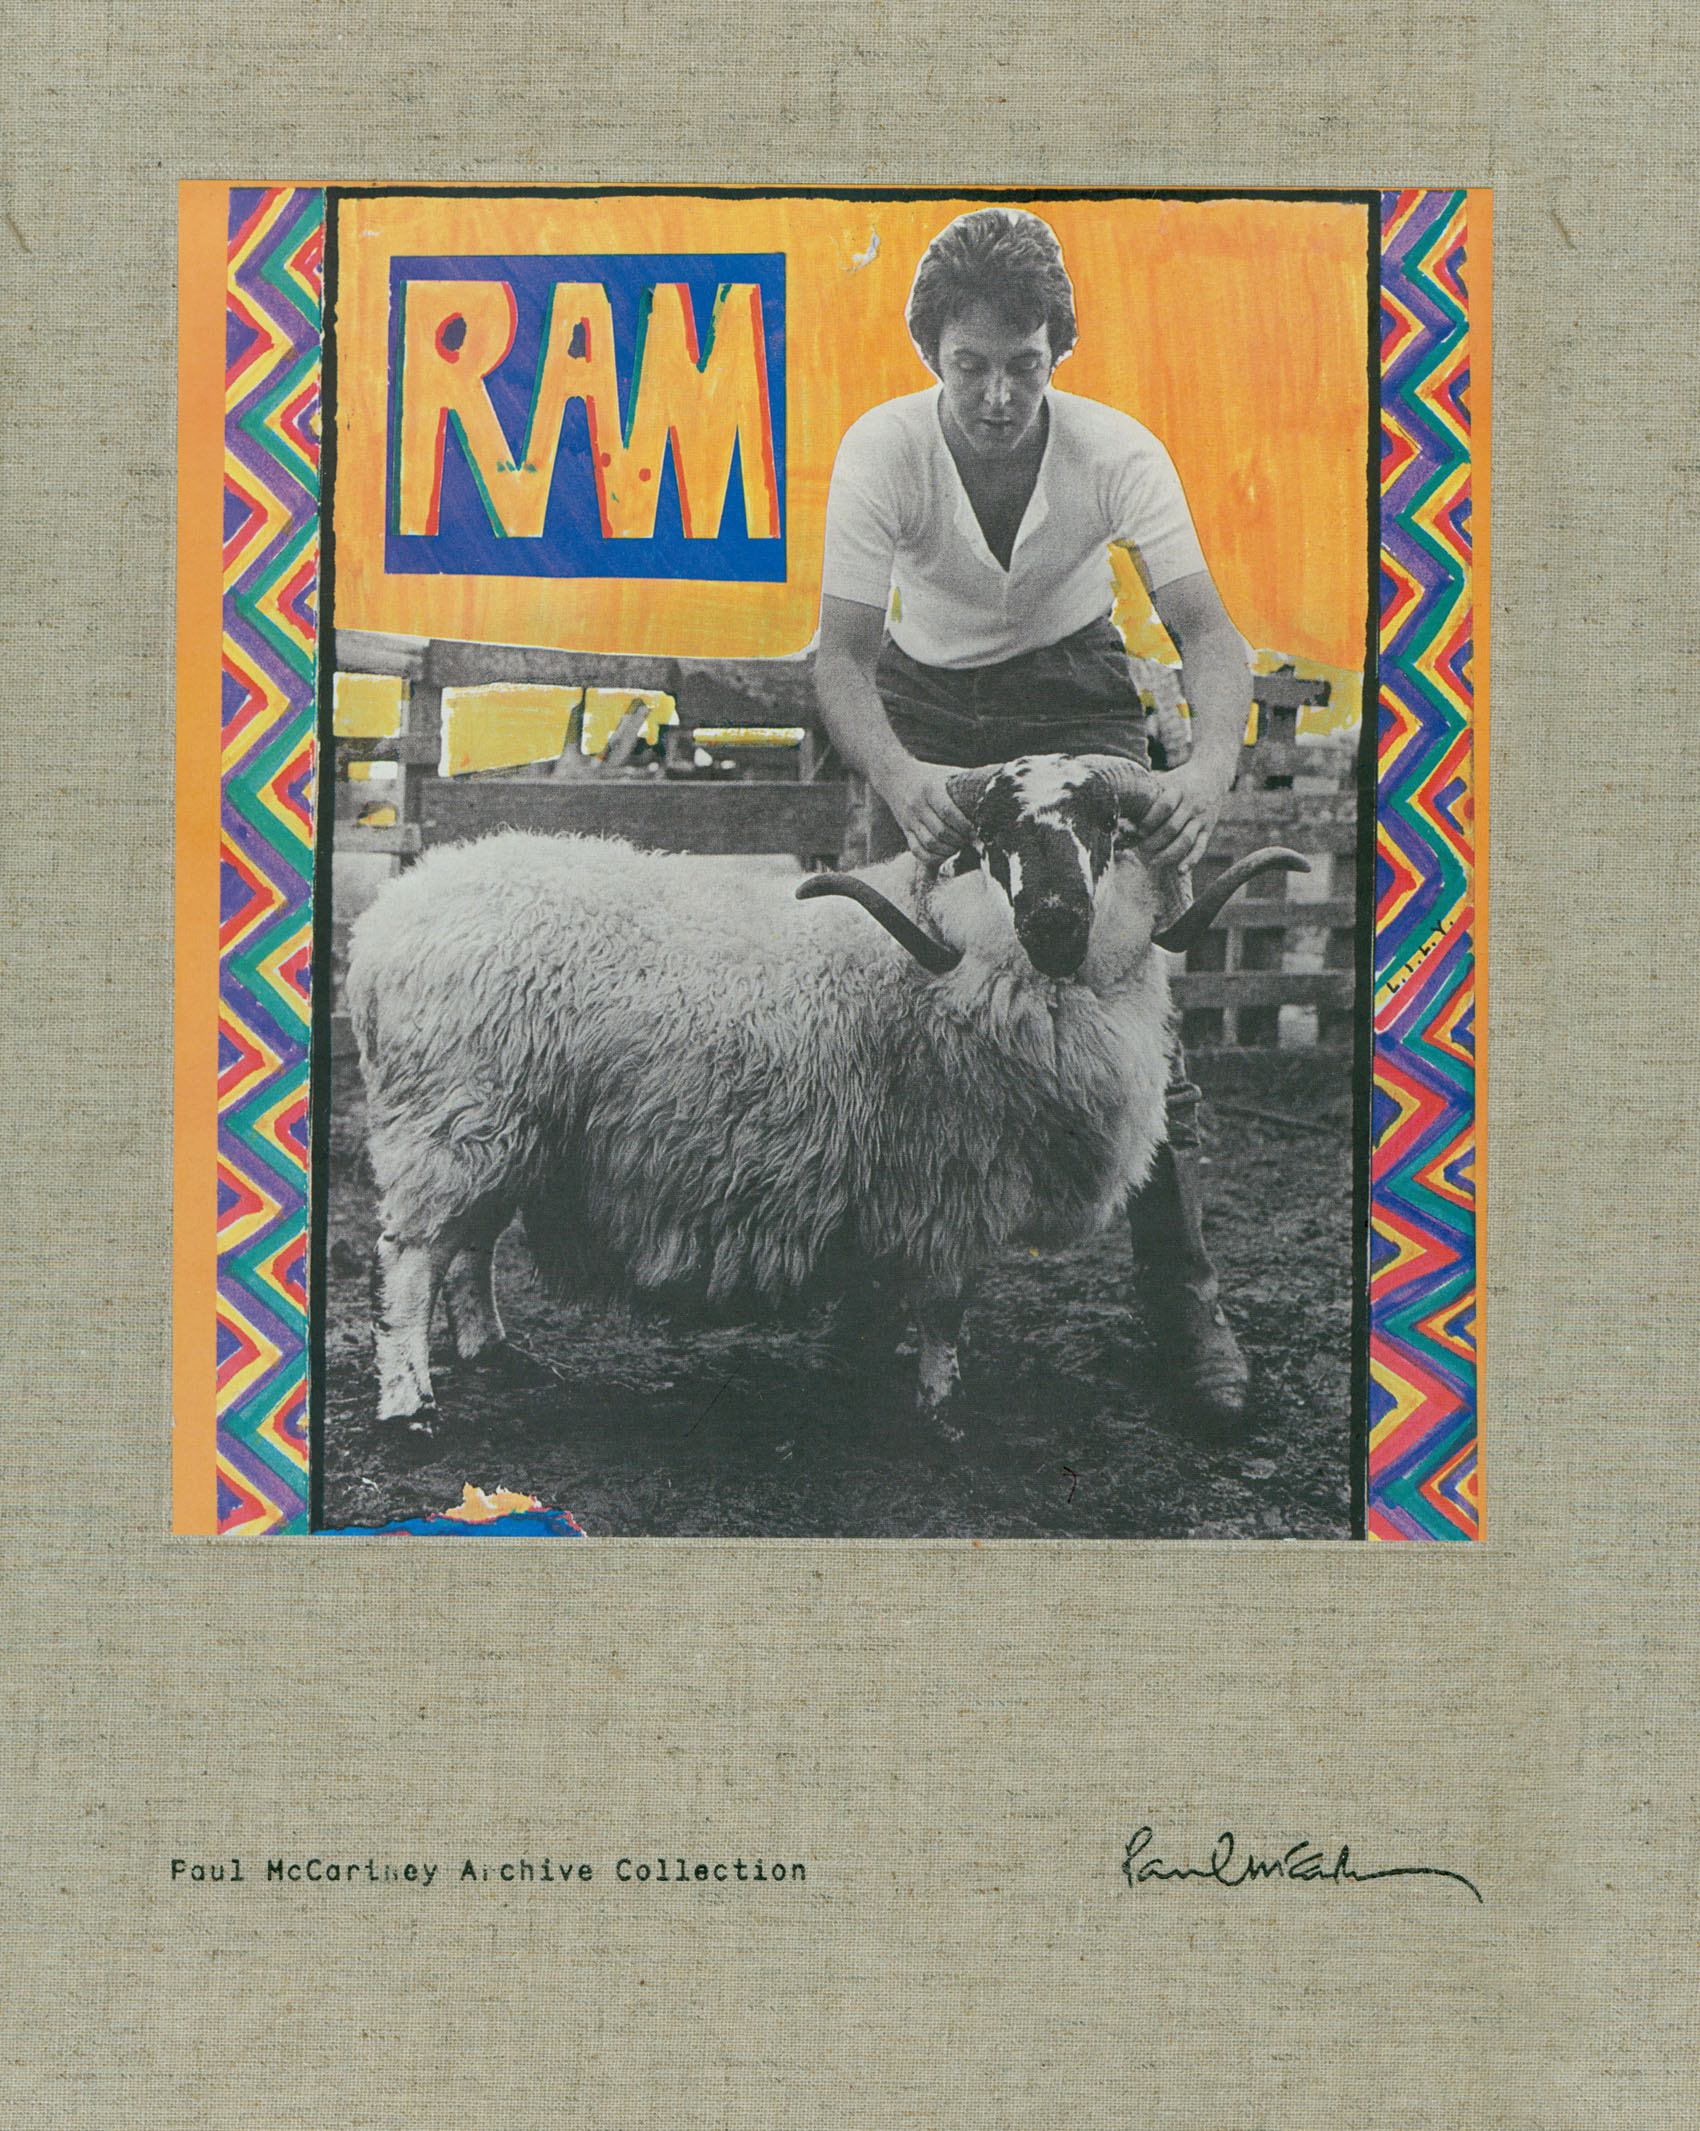 Paul McCartney and Linda McCartney: RAM - Archive Collection